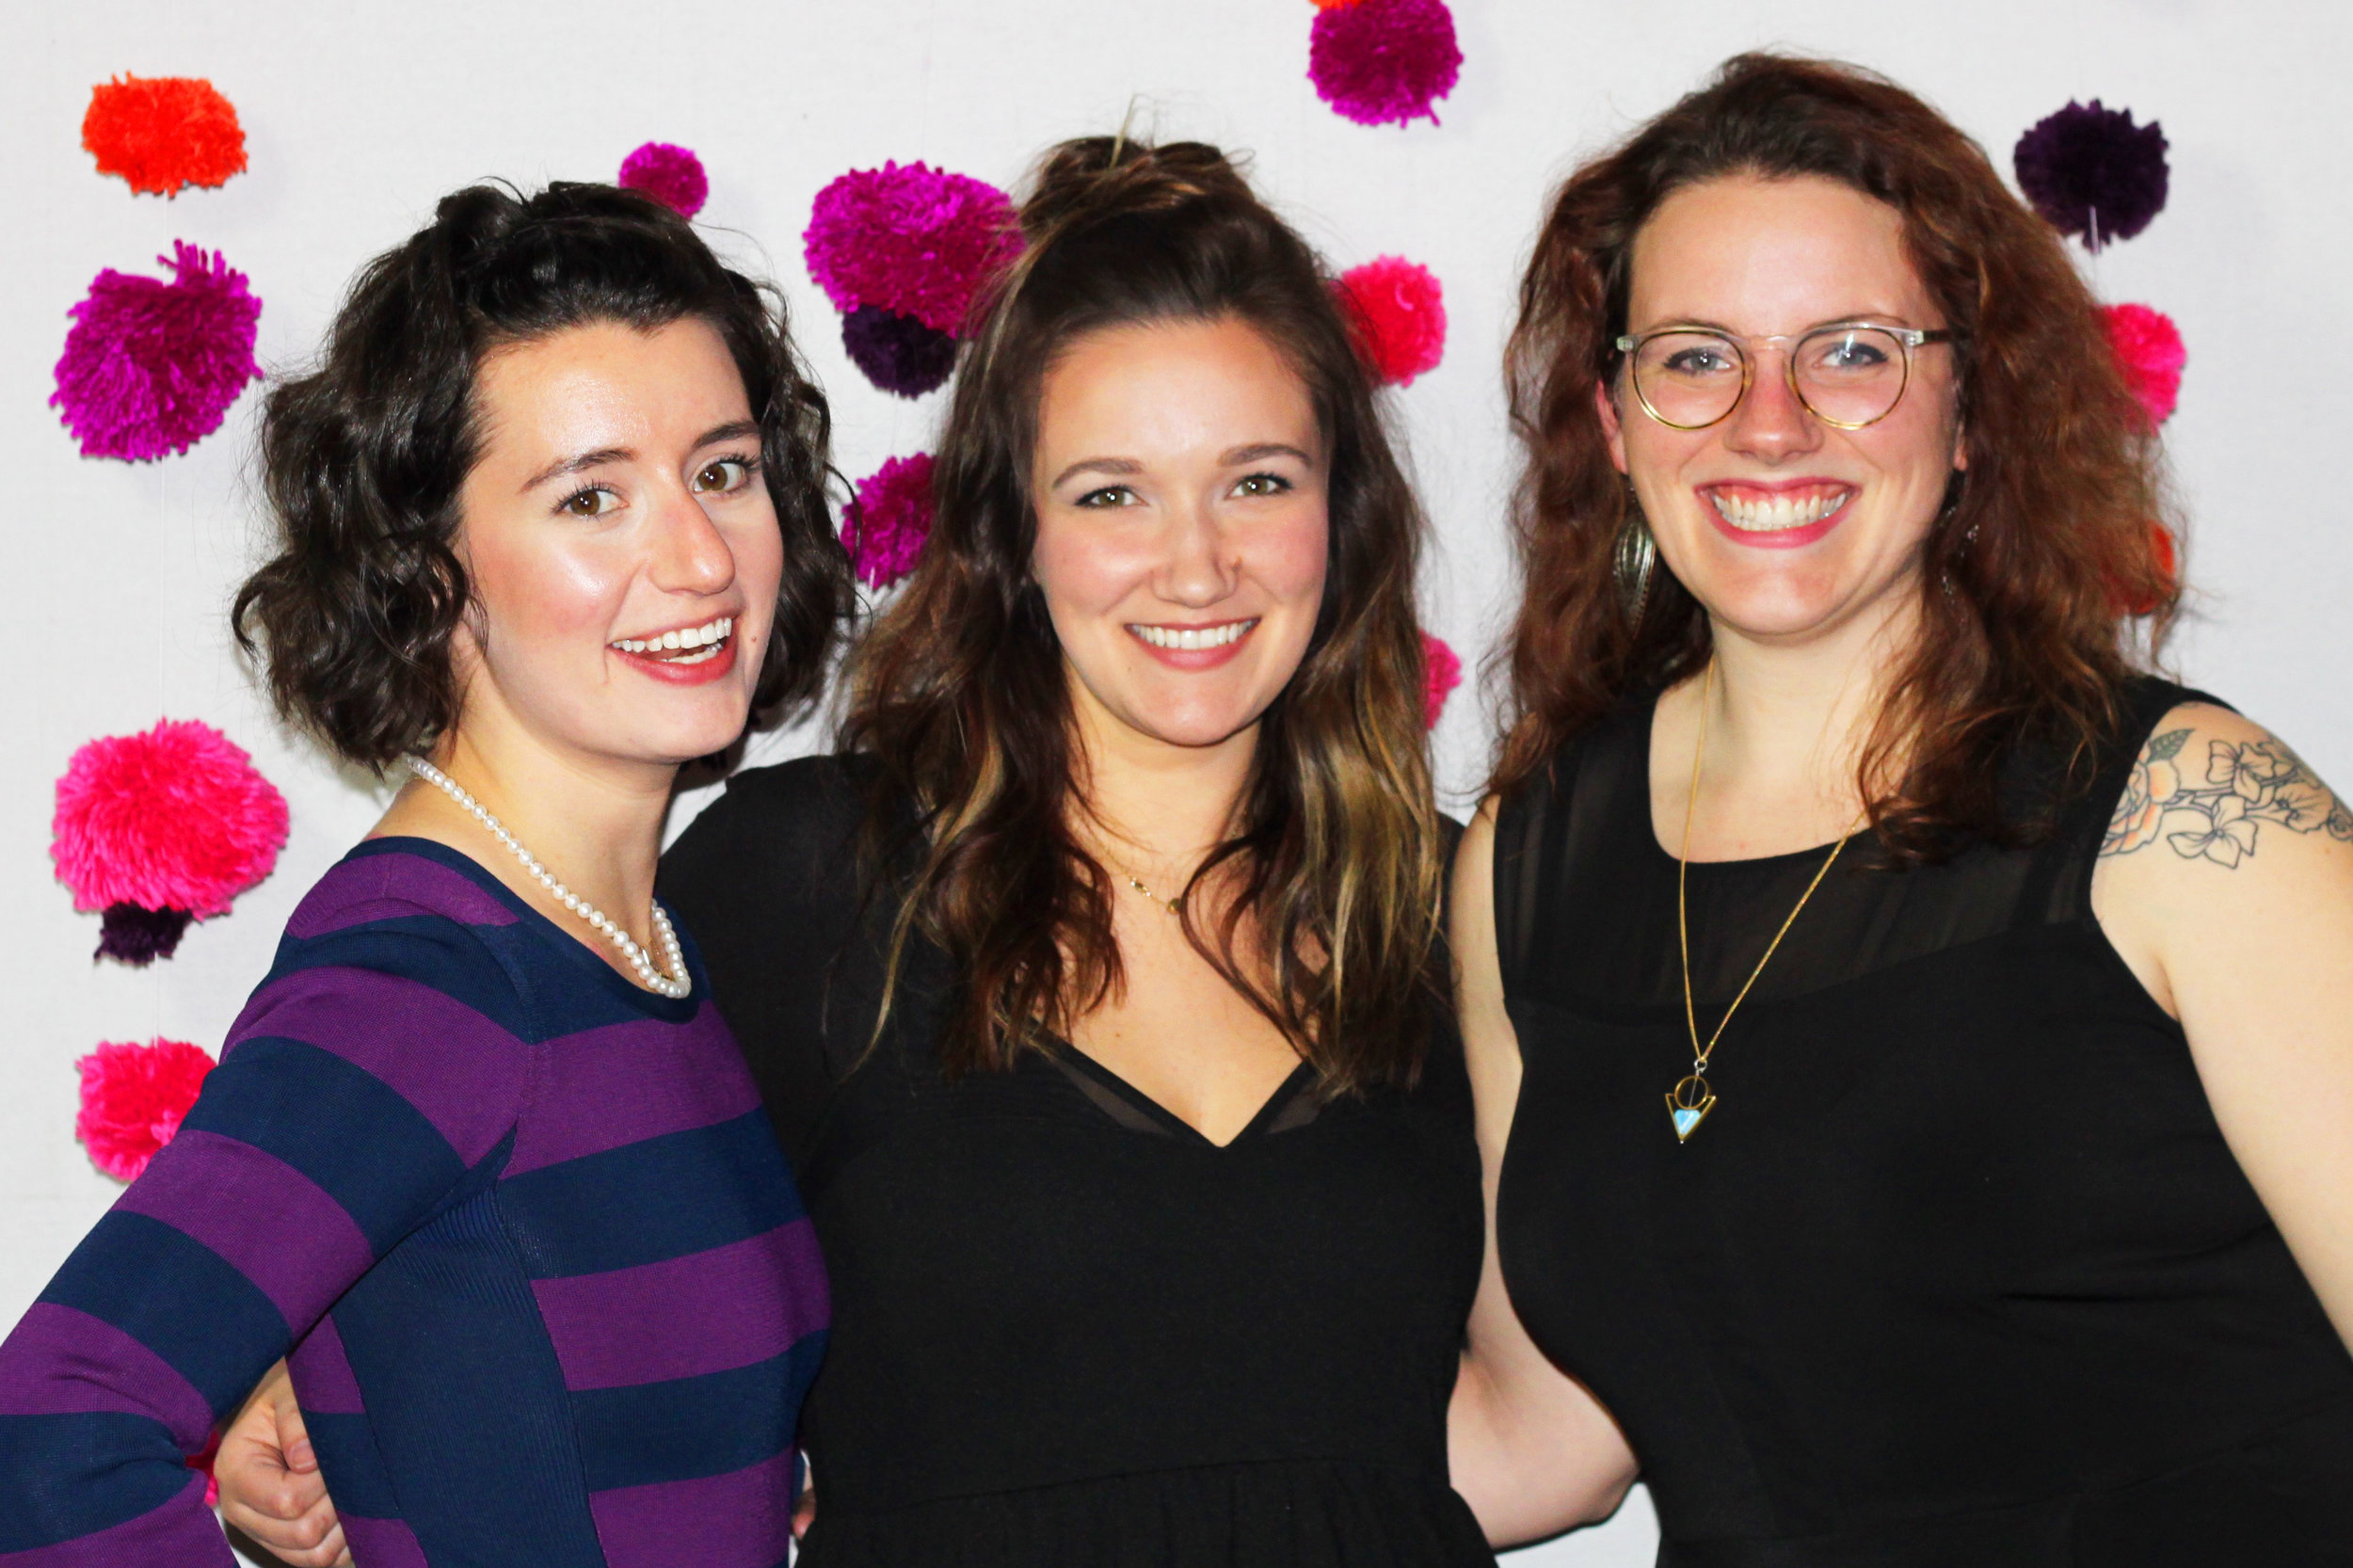 From left to right: Shannon Kaye, Amanda Glandon and Amelia Hruby